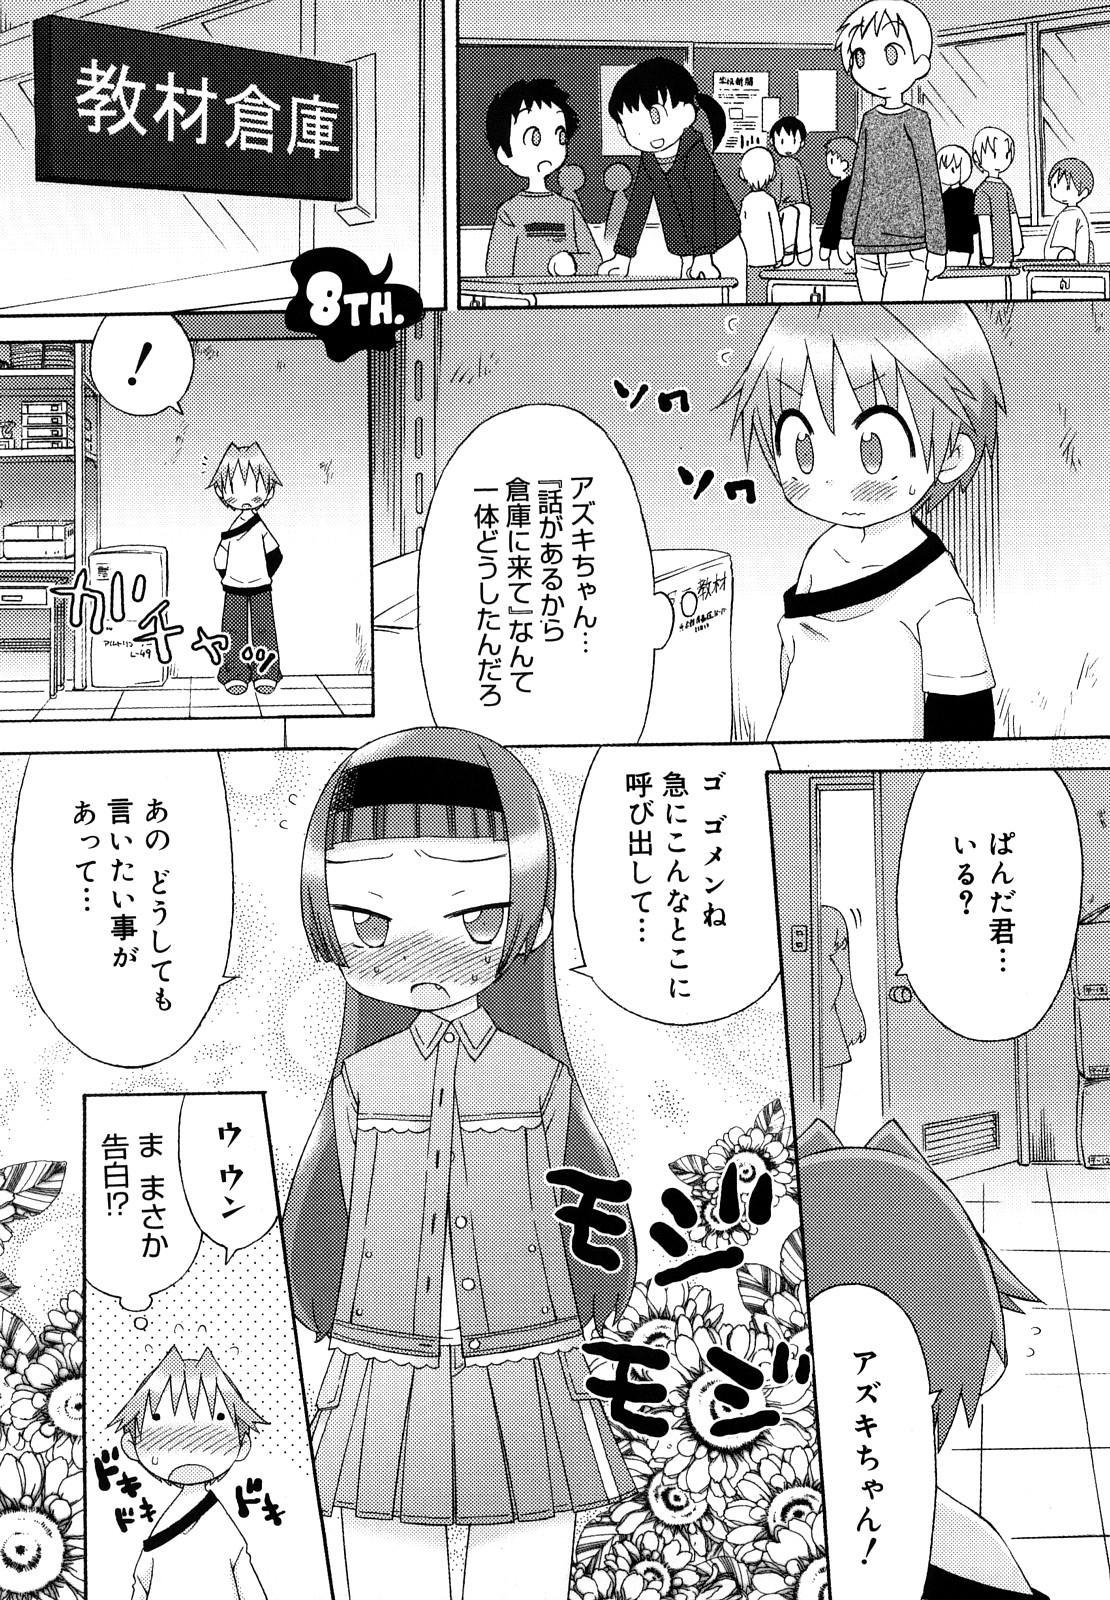 Hatsuden Pandakun! Shinsouban 149